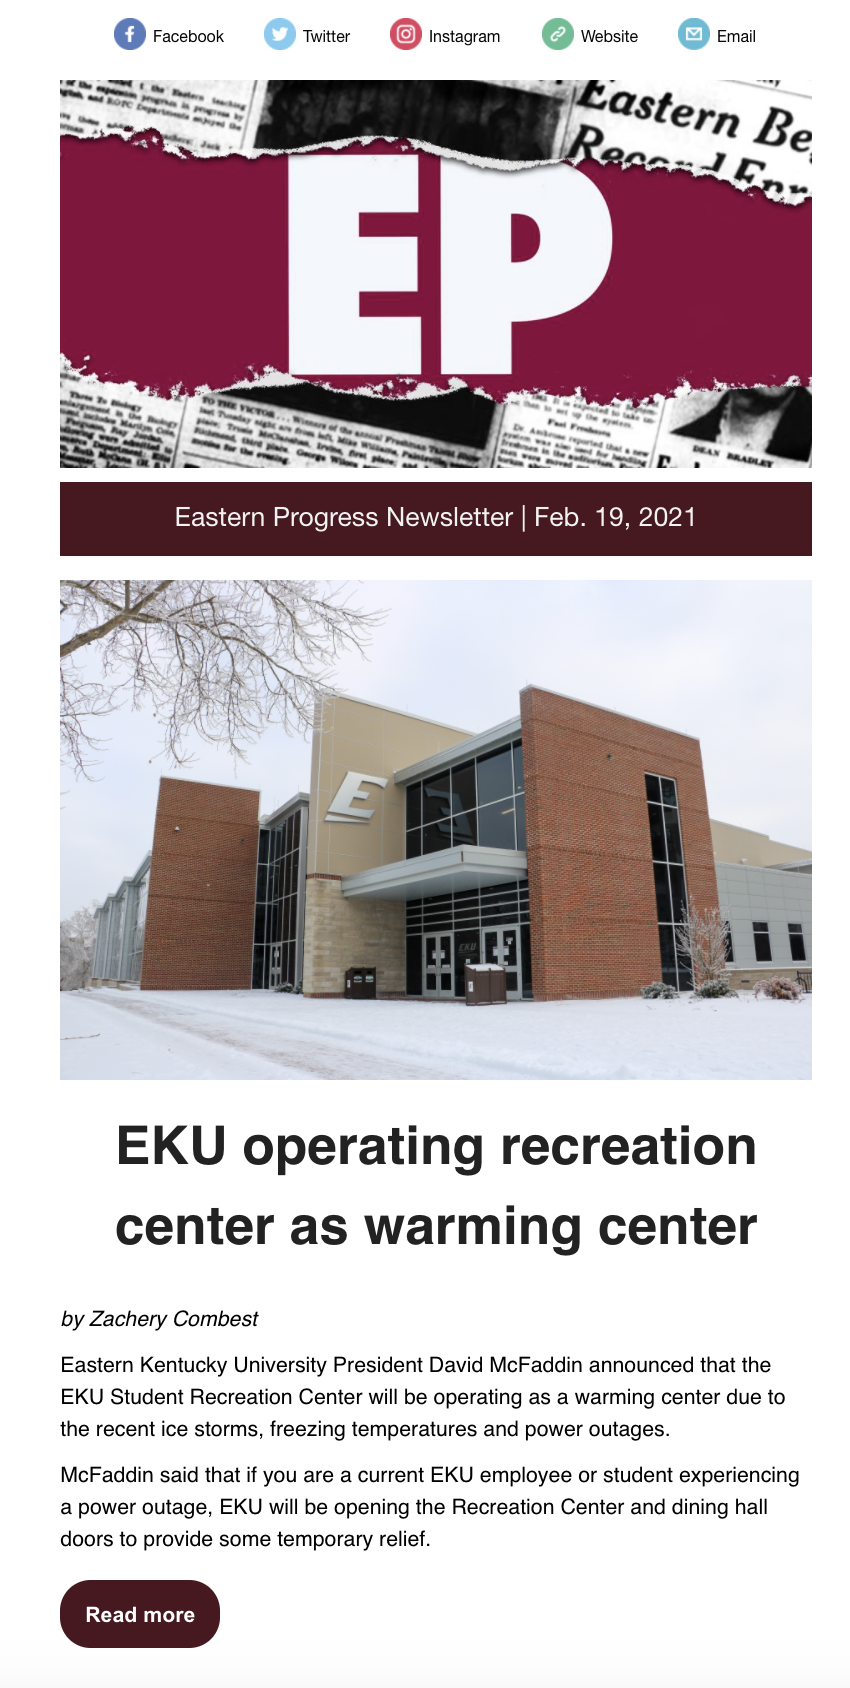 Feb. 19 Eastern Progress newsletter front page